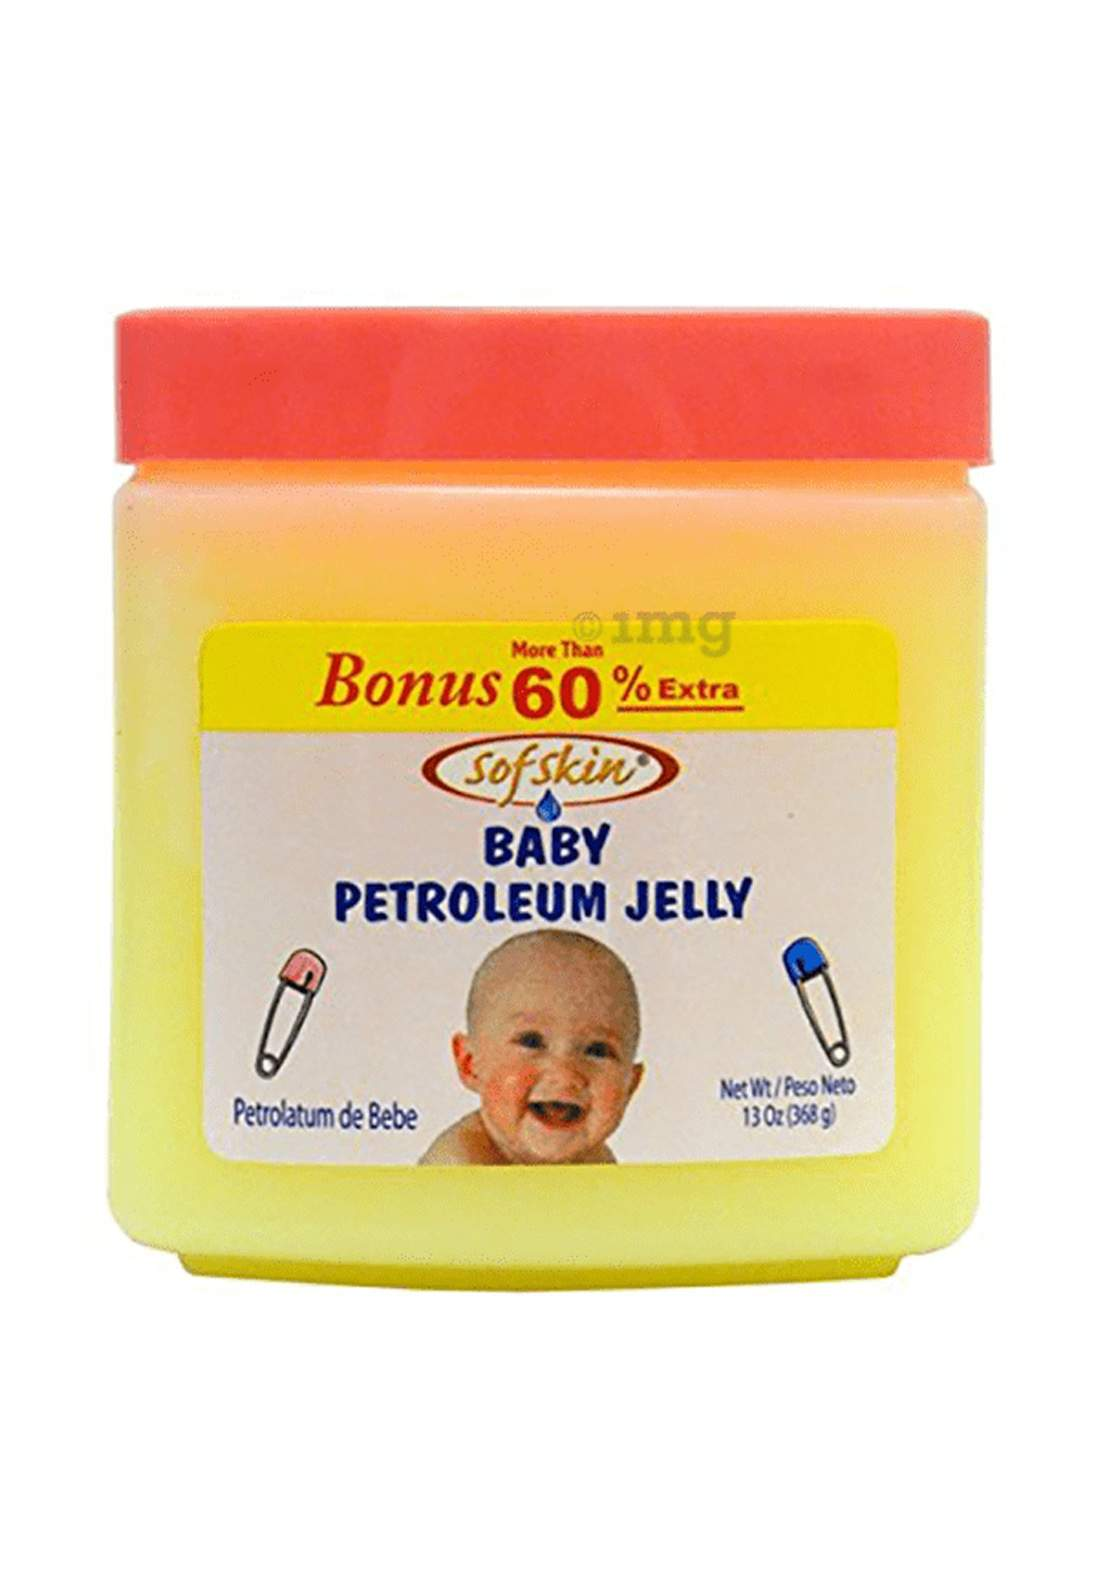 Sofskin Pure Petroleum Jelly Baby(226 g) جلي نقي للاطفال